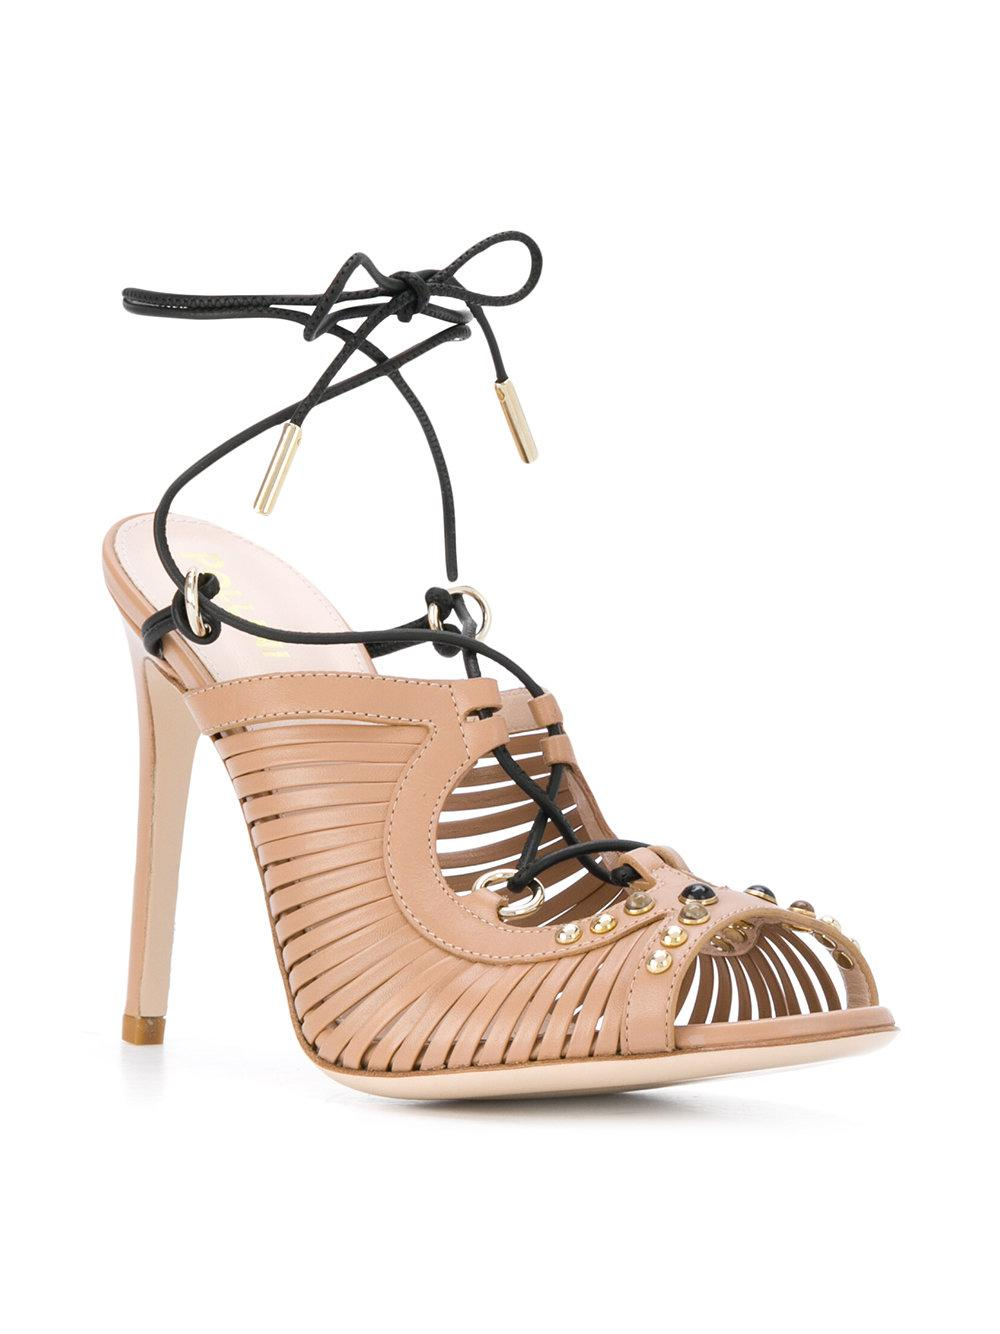 strappy ankle sandals - Nude & Neutrals Pollini lUZPc